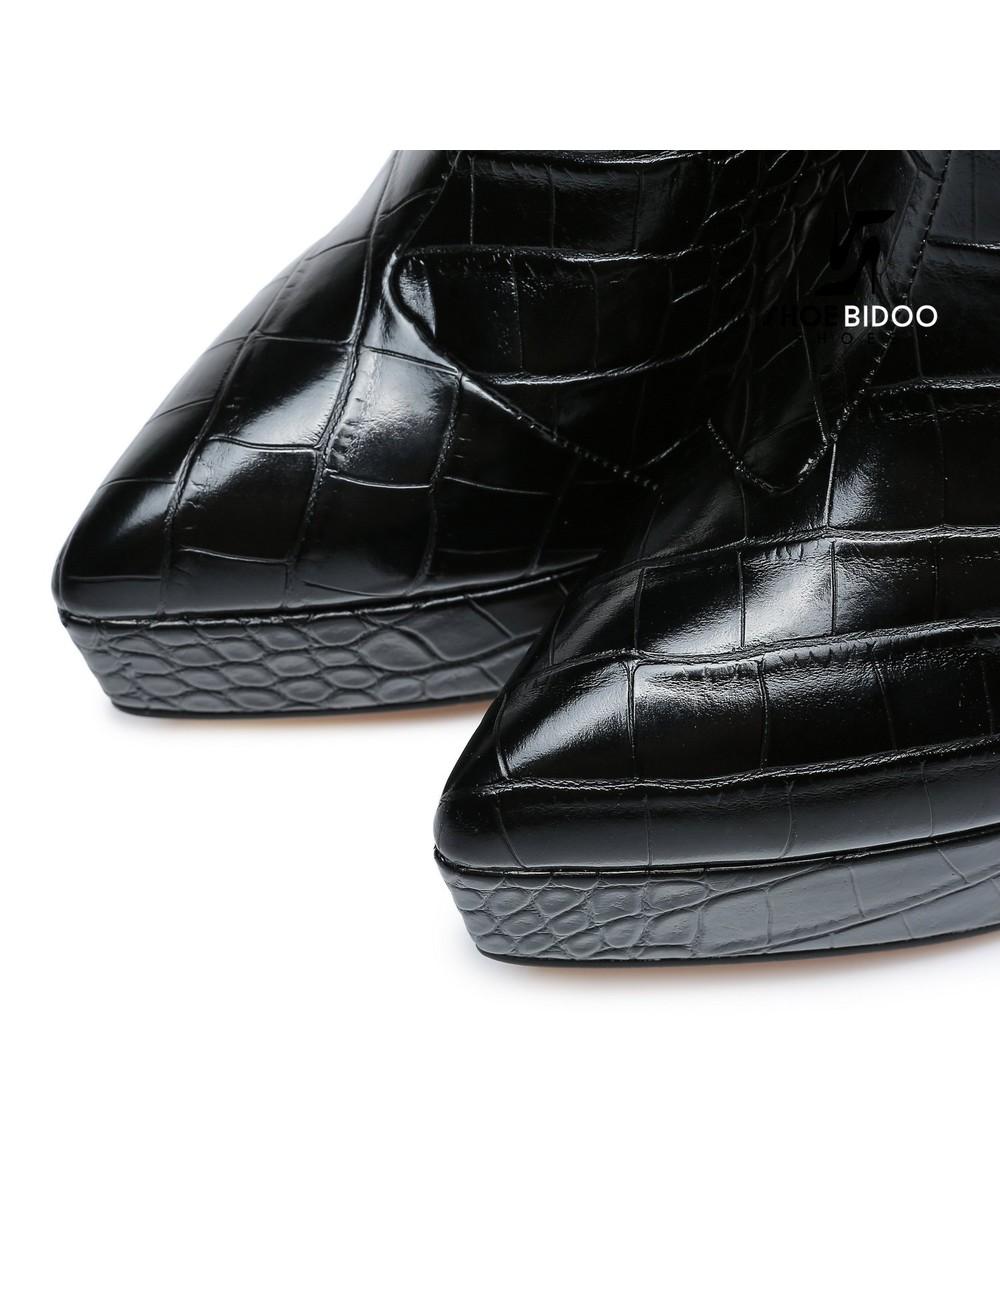 Giaro Giaro Platform enkellaars STACK in zwart kroko print